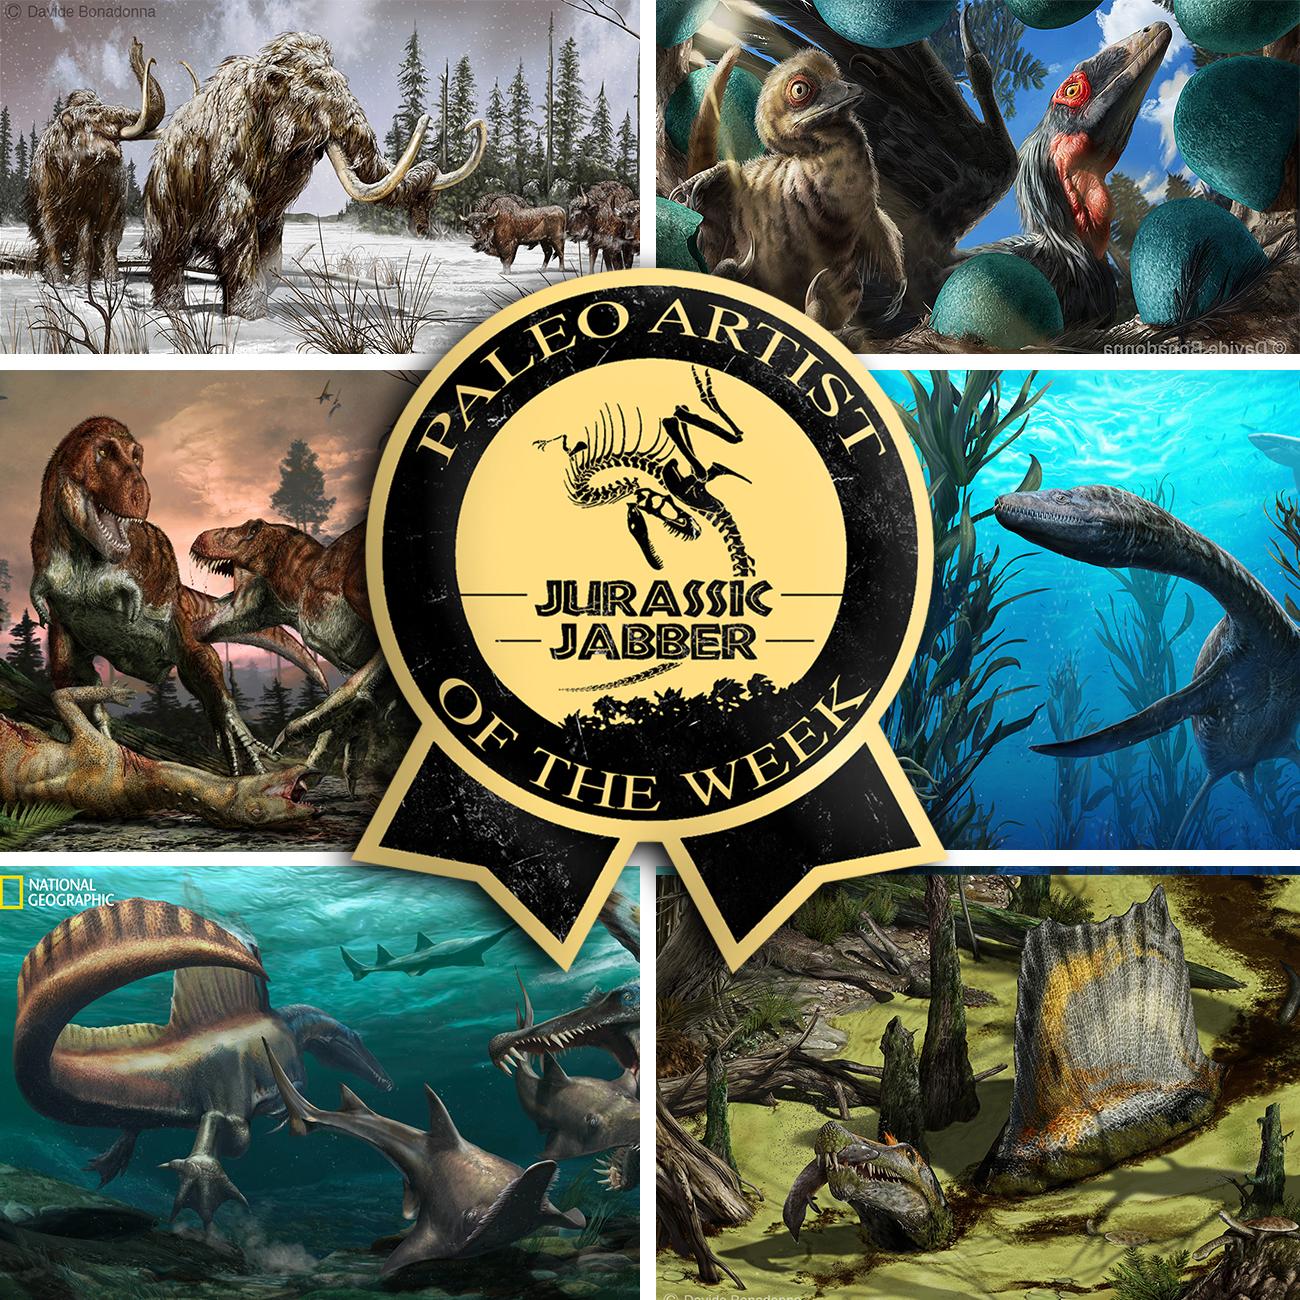 PaleoArtist-DavideBonadonna